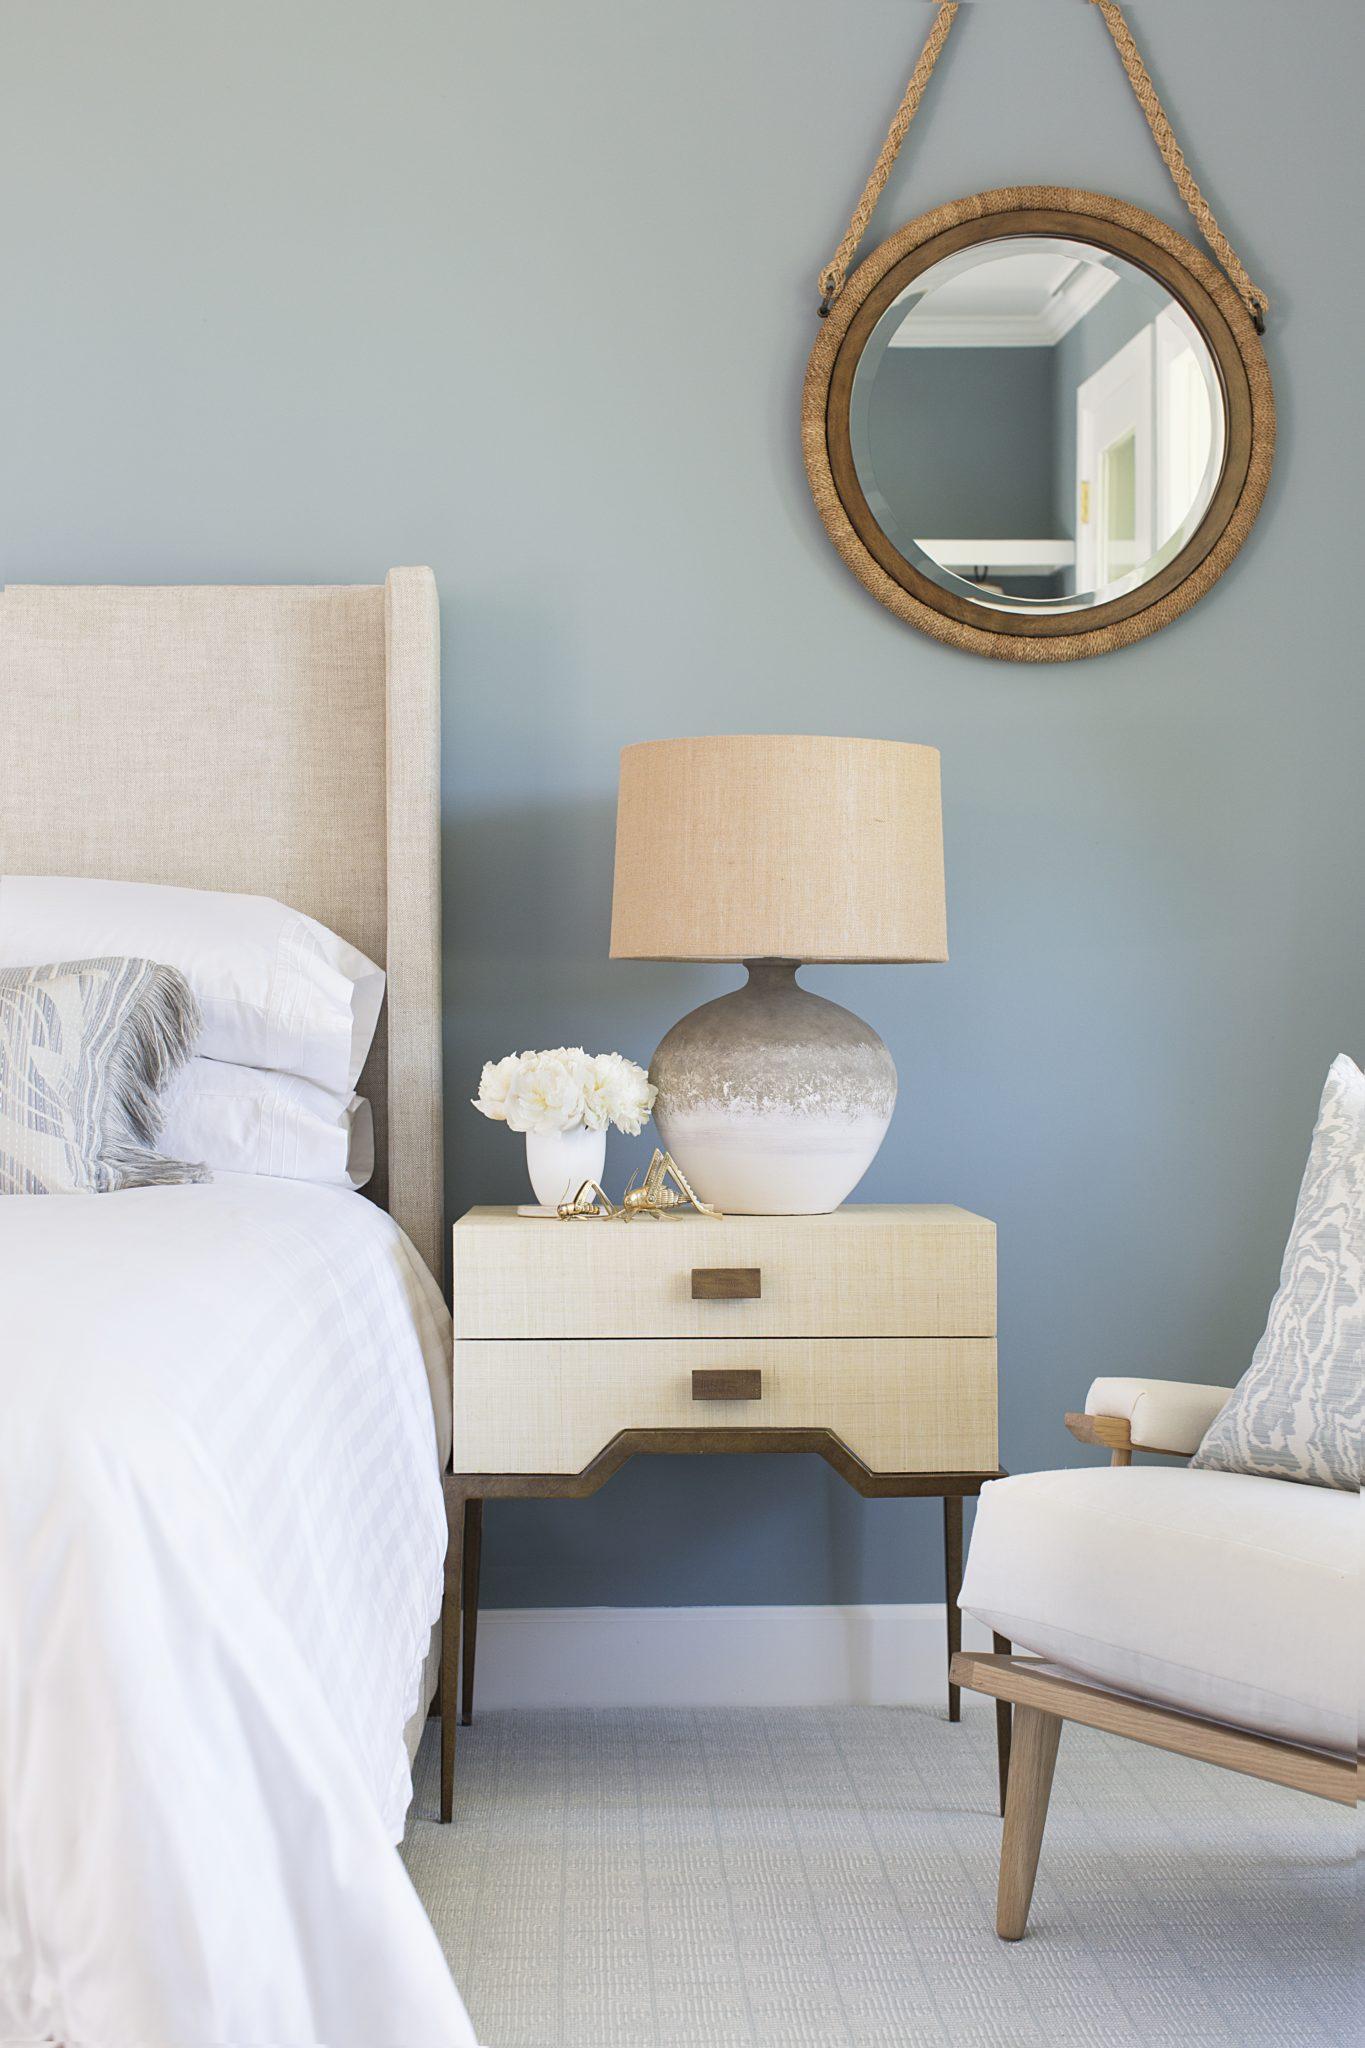 Napa Bedroom Remodels by Erin King Interiors